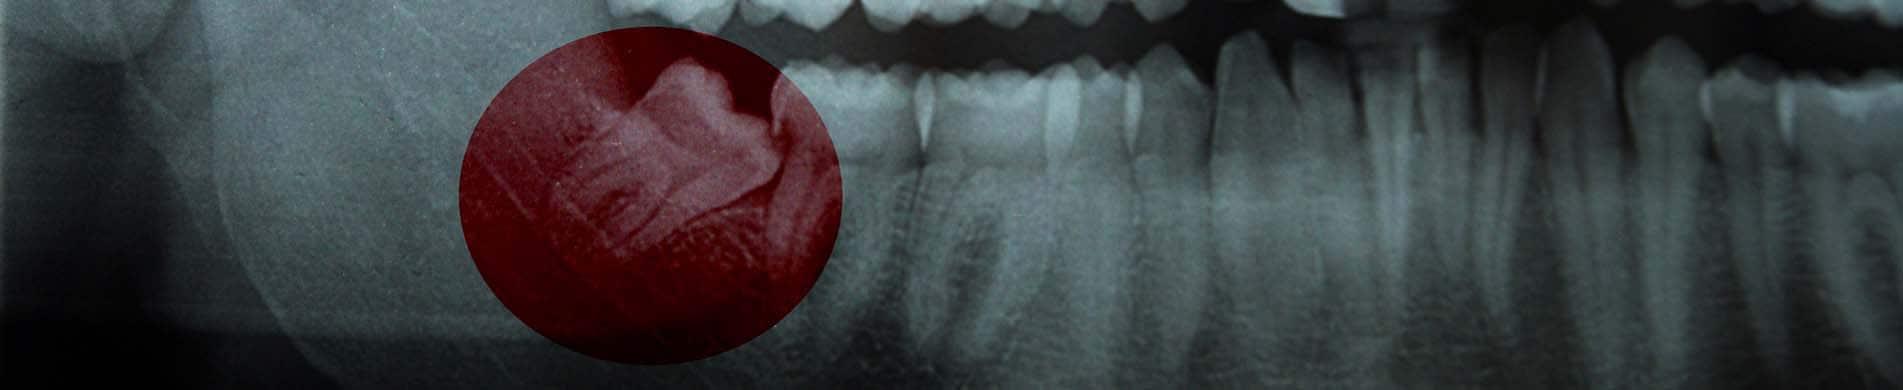 Wisdom Teeth - dental care